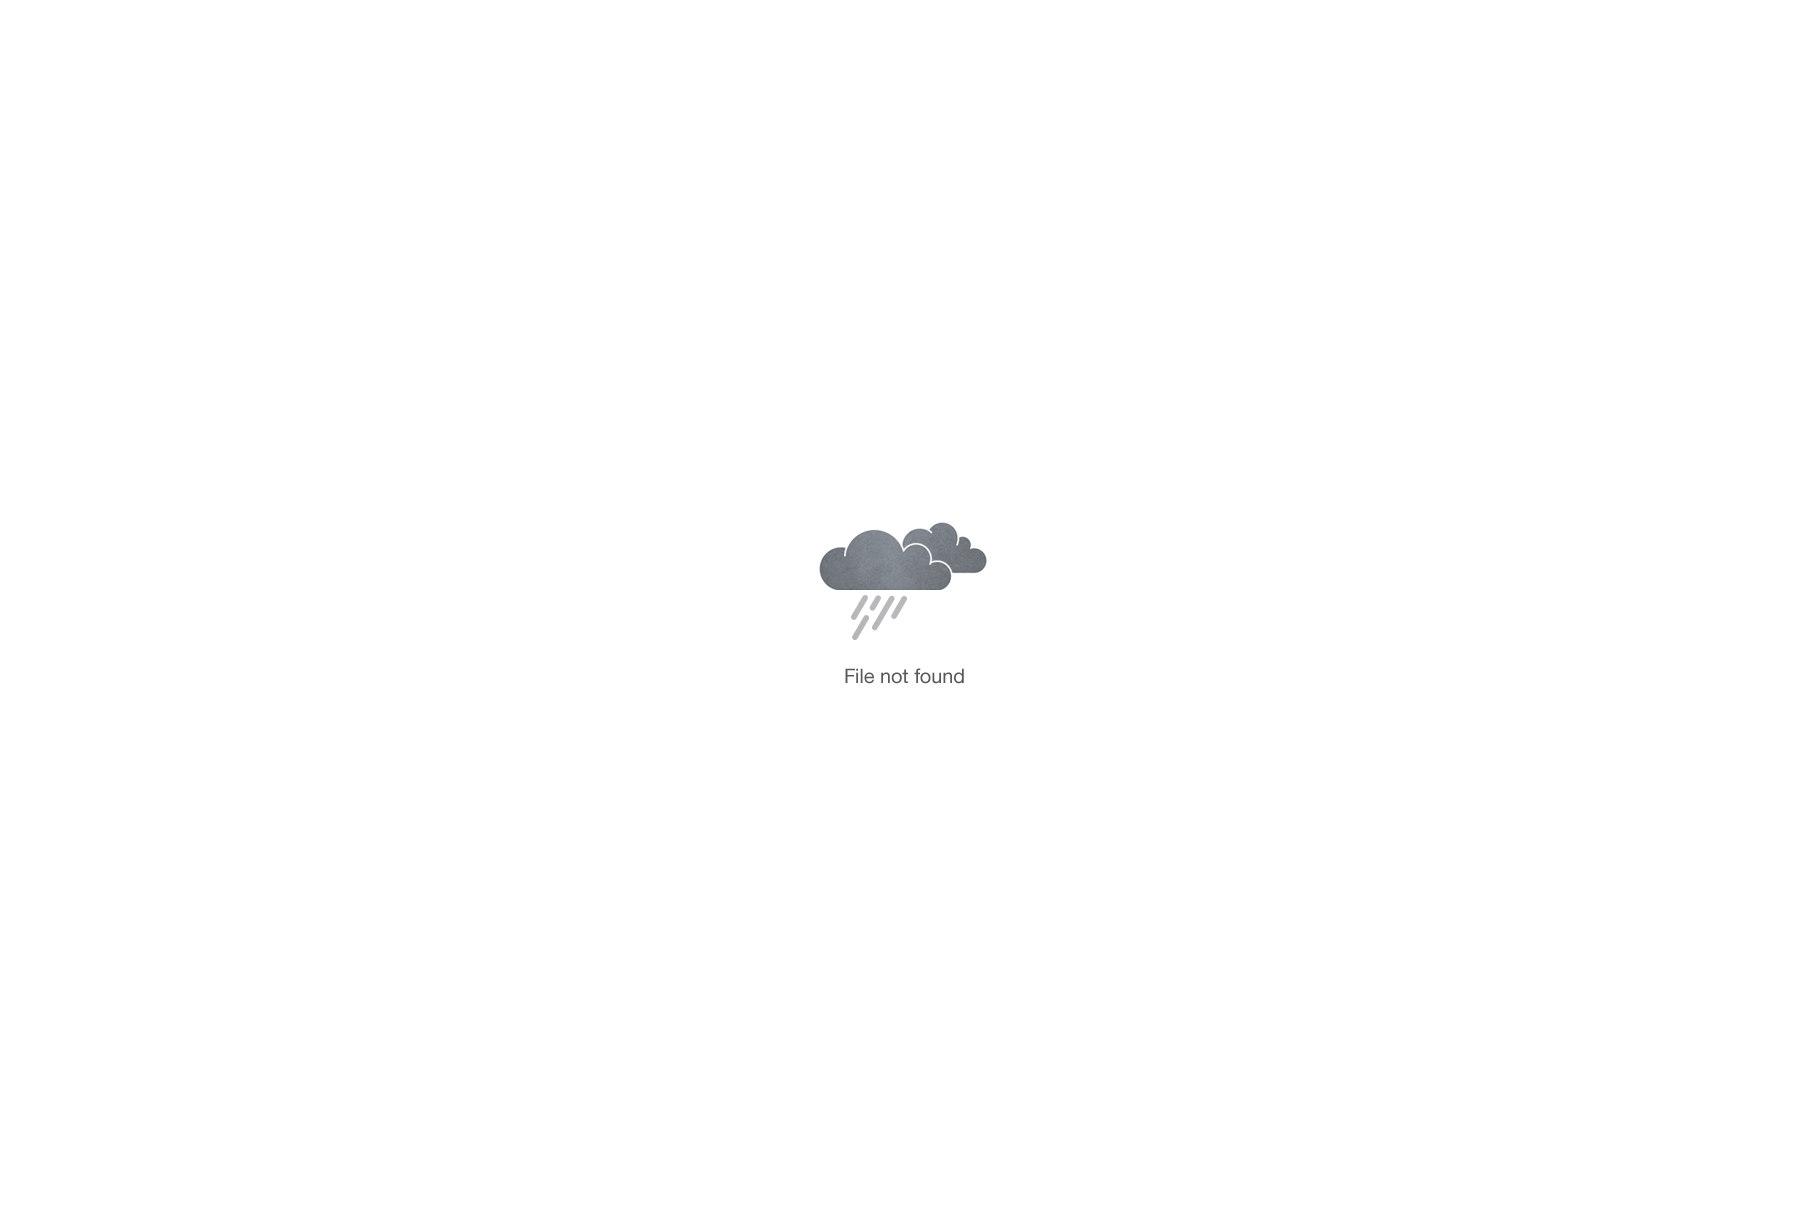 Yohan-Thevenot-triathlon-Sponsorise-me-image-4